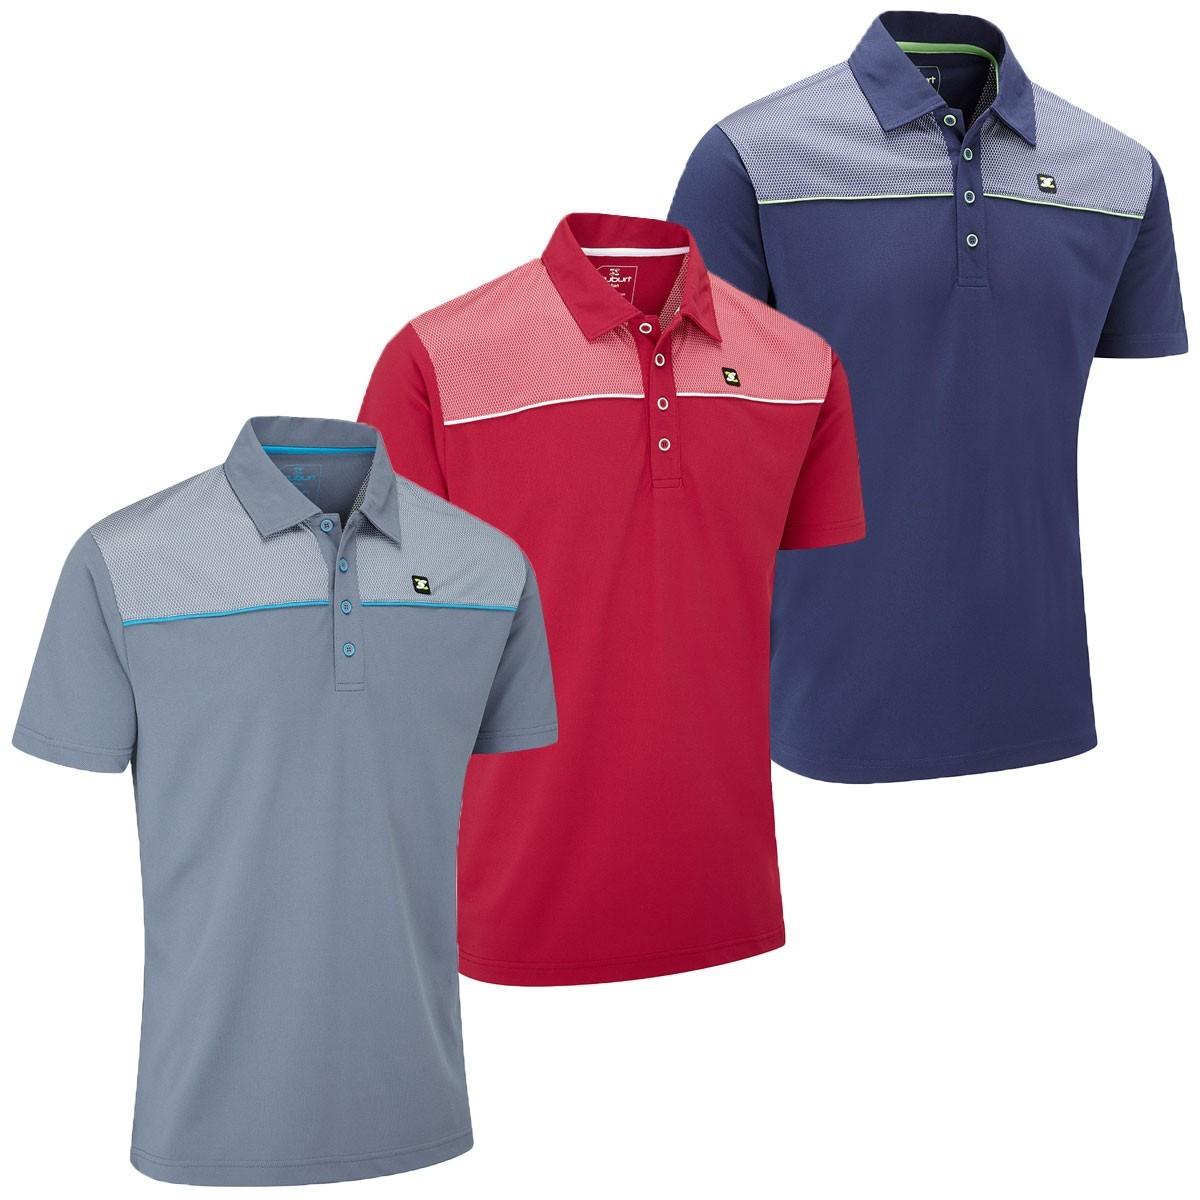 Stuburt 2017 Mens Urban Fashion Polo Shirt Golf Polo